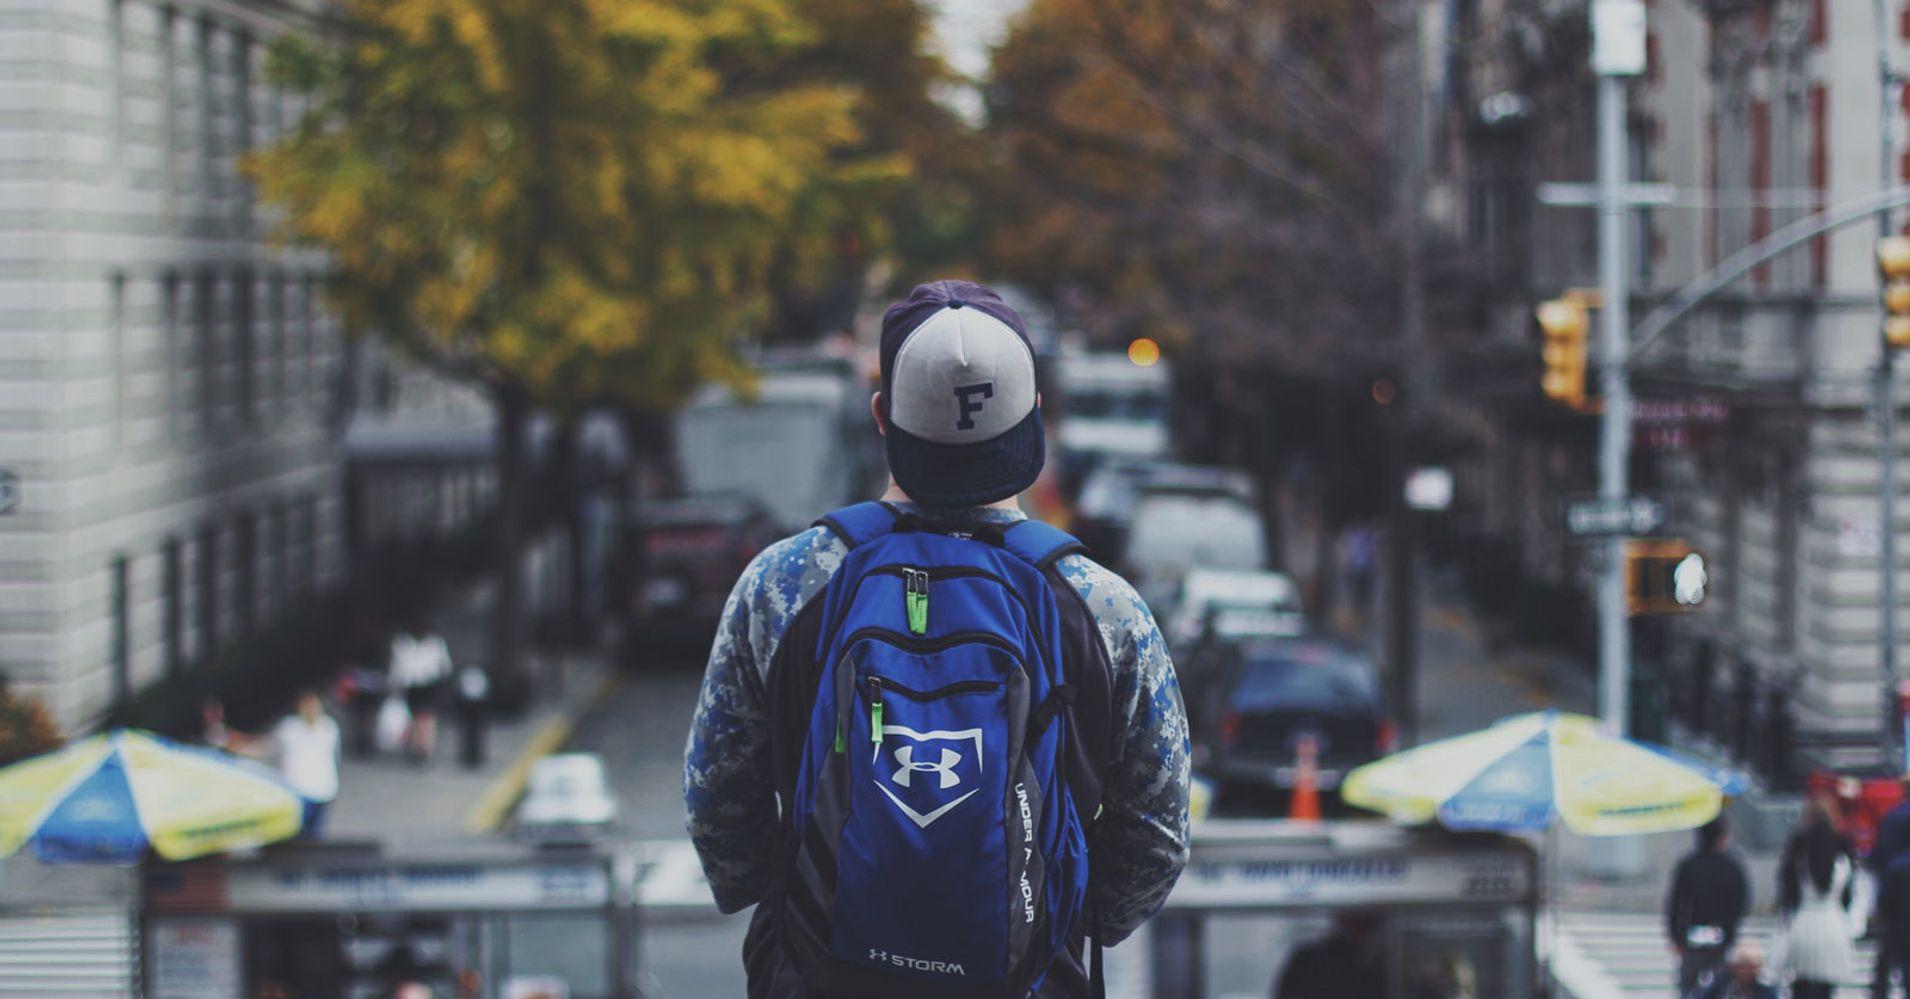 Your Millennial Marketing Effort Isn't Working | HuffPost